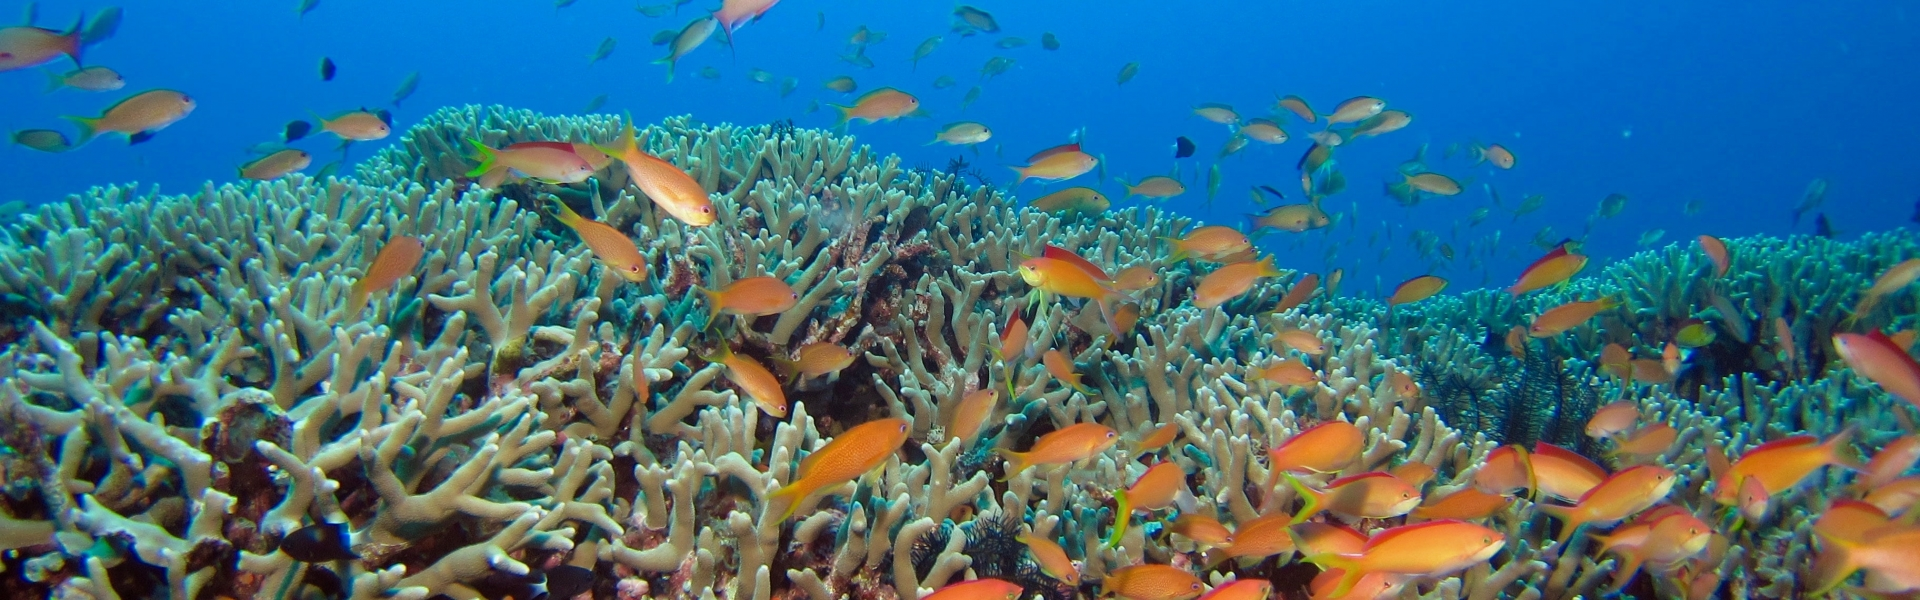 Fish swimming among coral